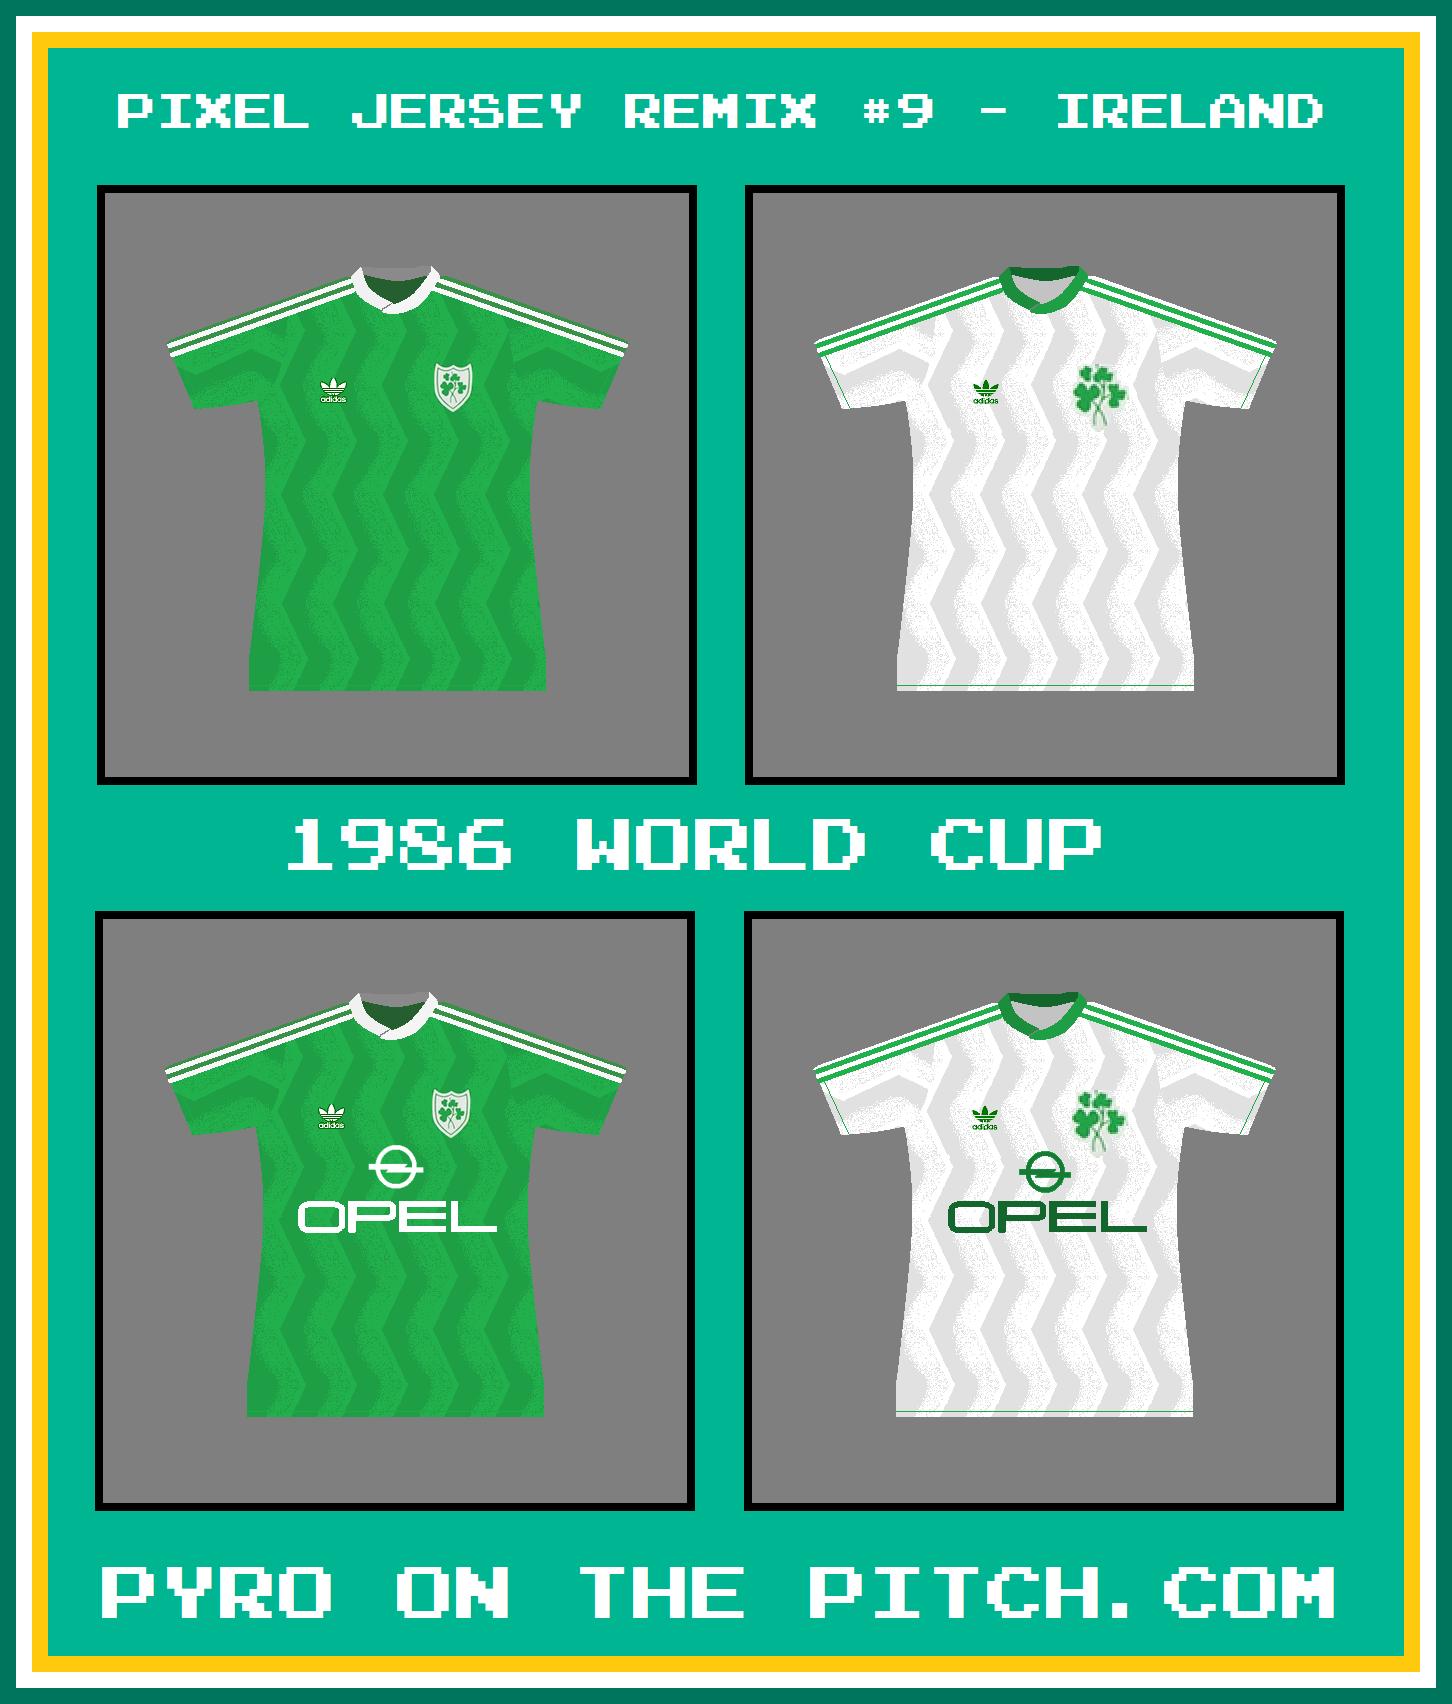 ireland adidas 1986 all